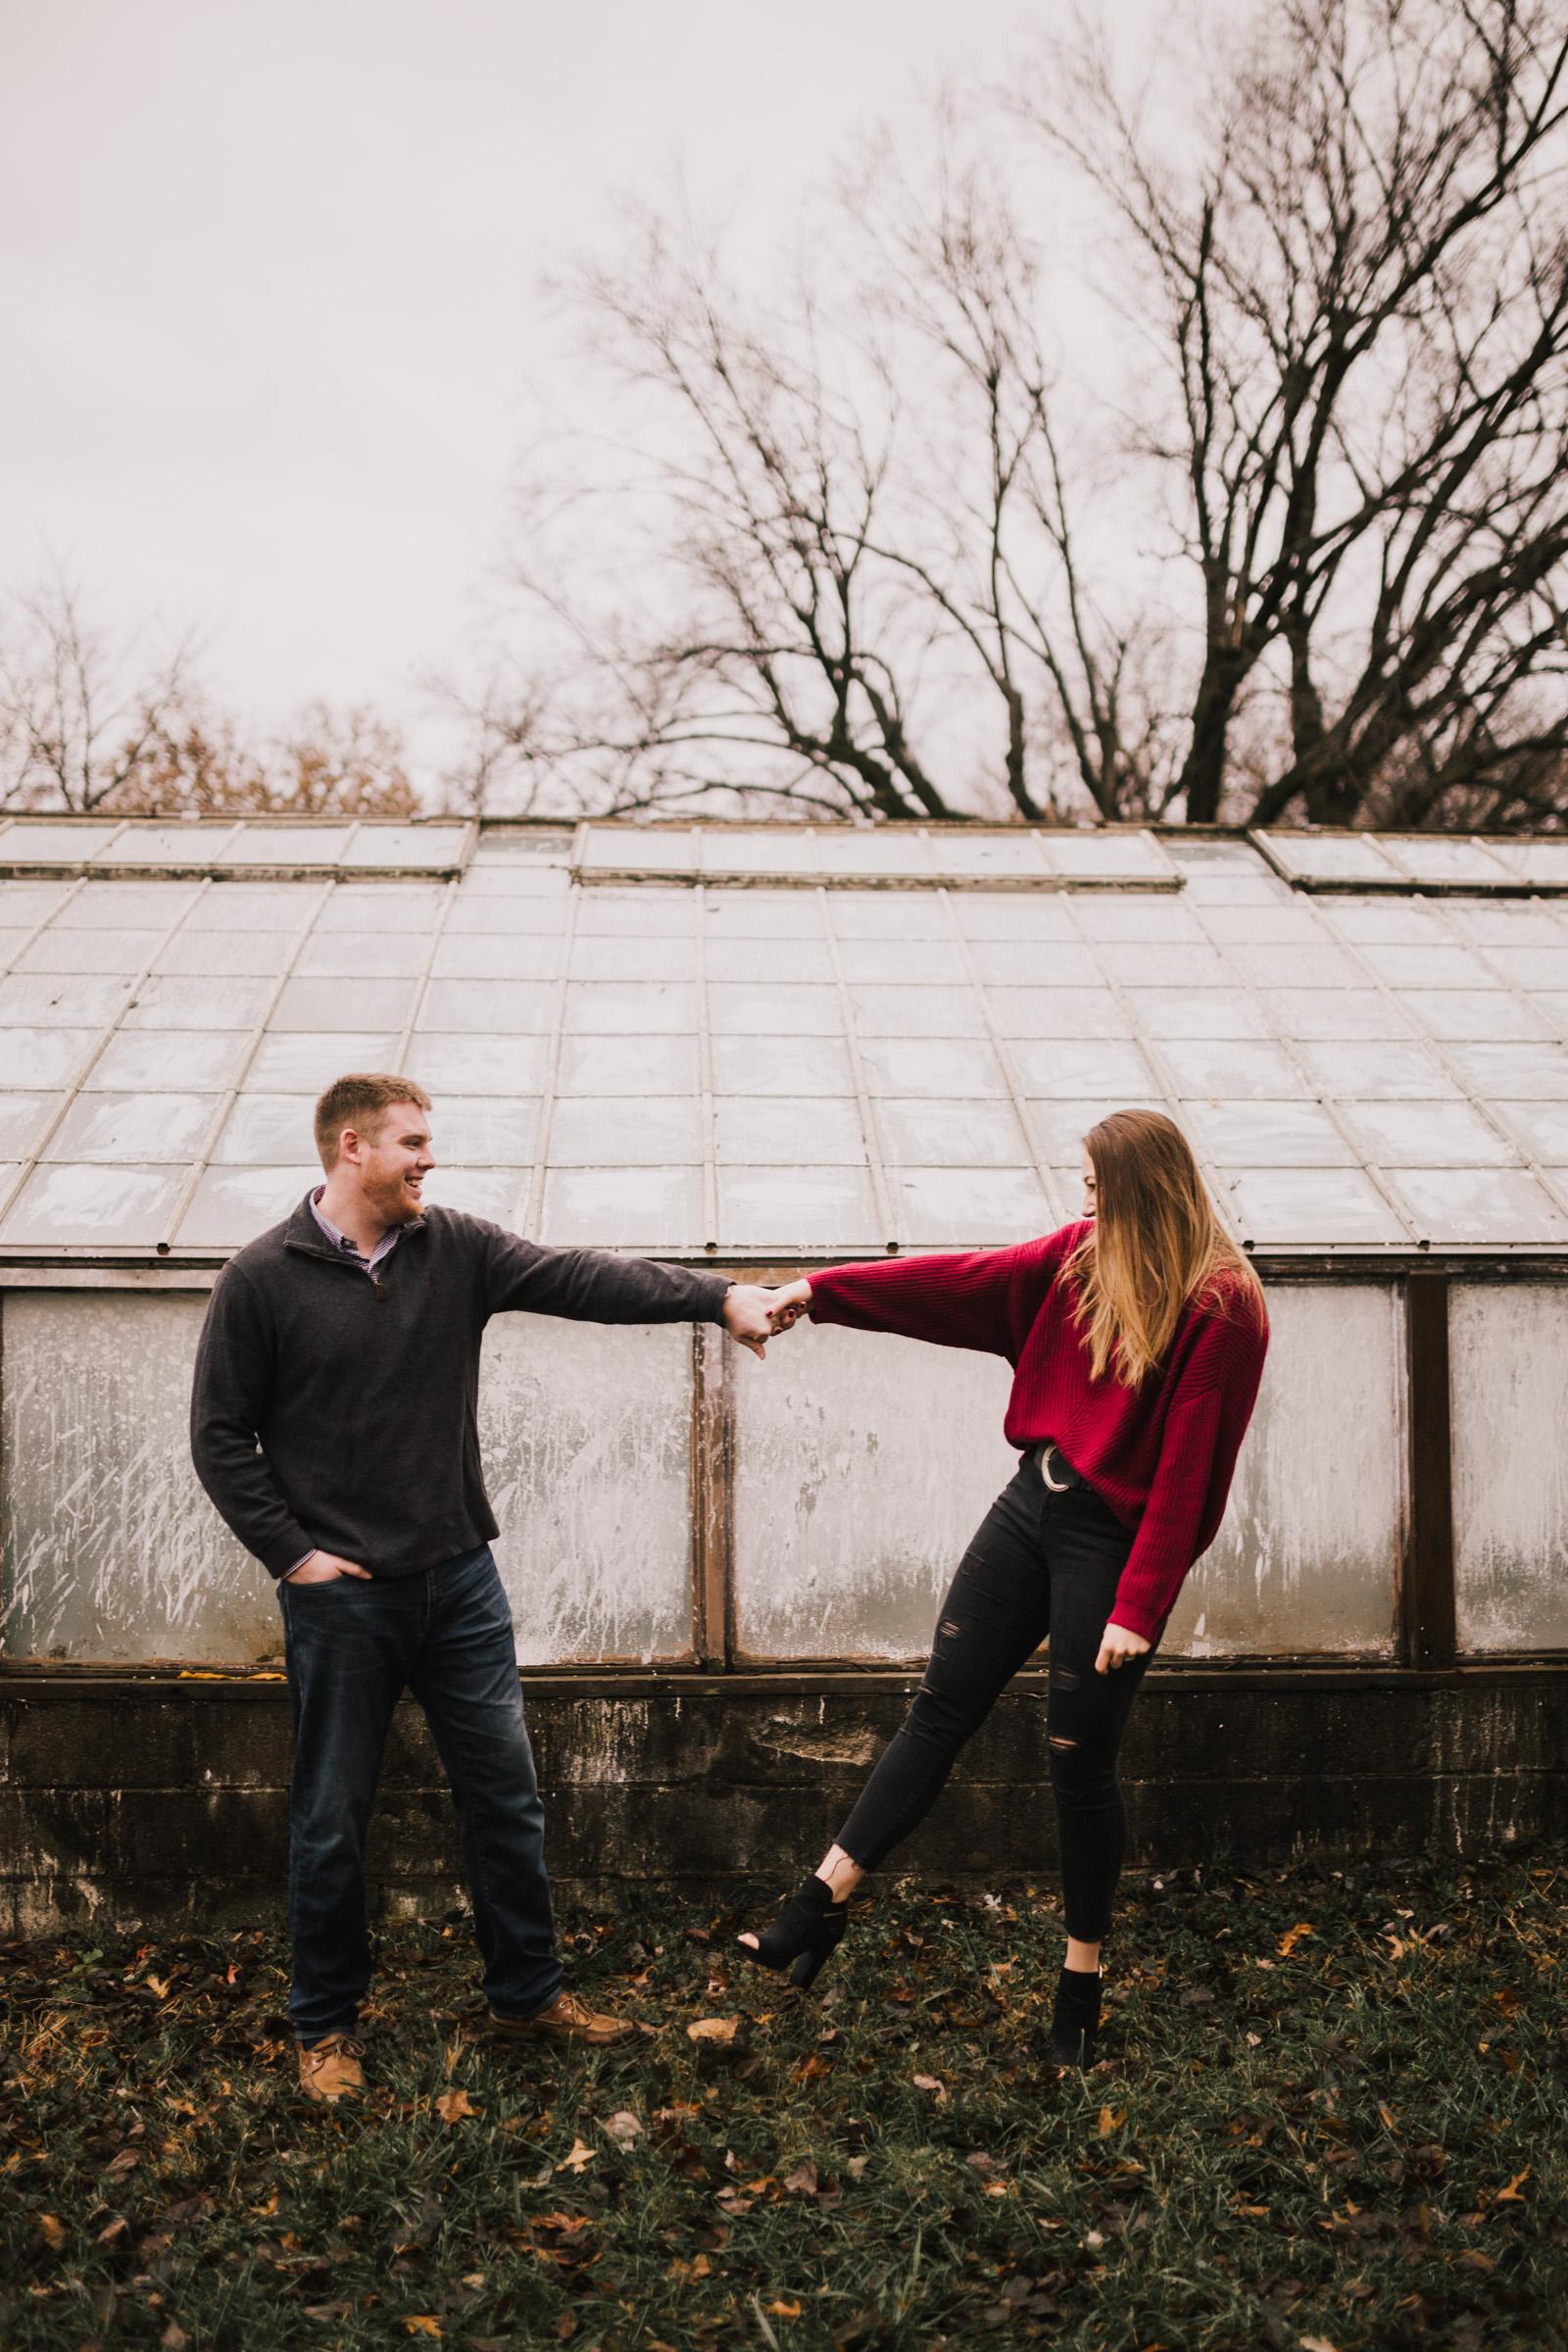 alyssa barletter photography johns greenhouse kansas city missouri brookside waldo engagement session winter-3.jpg